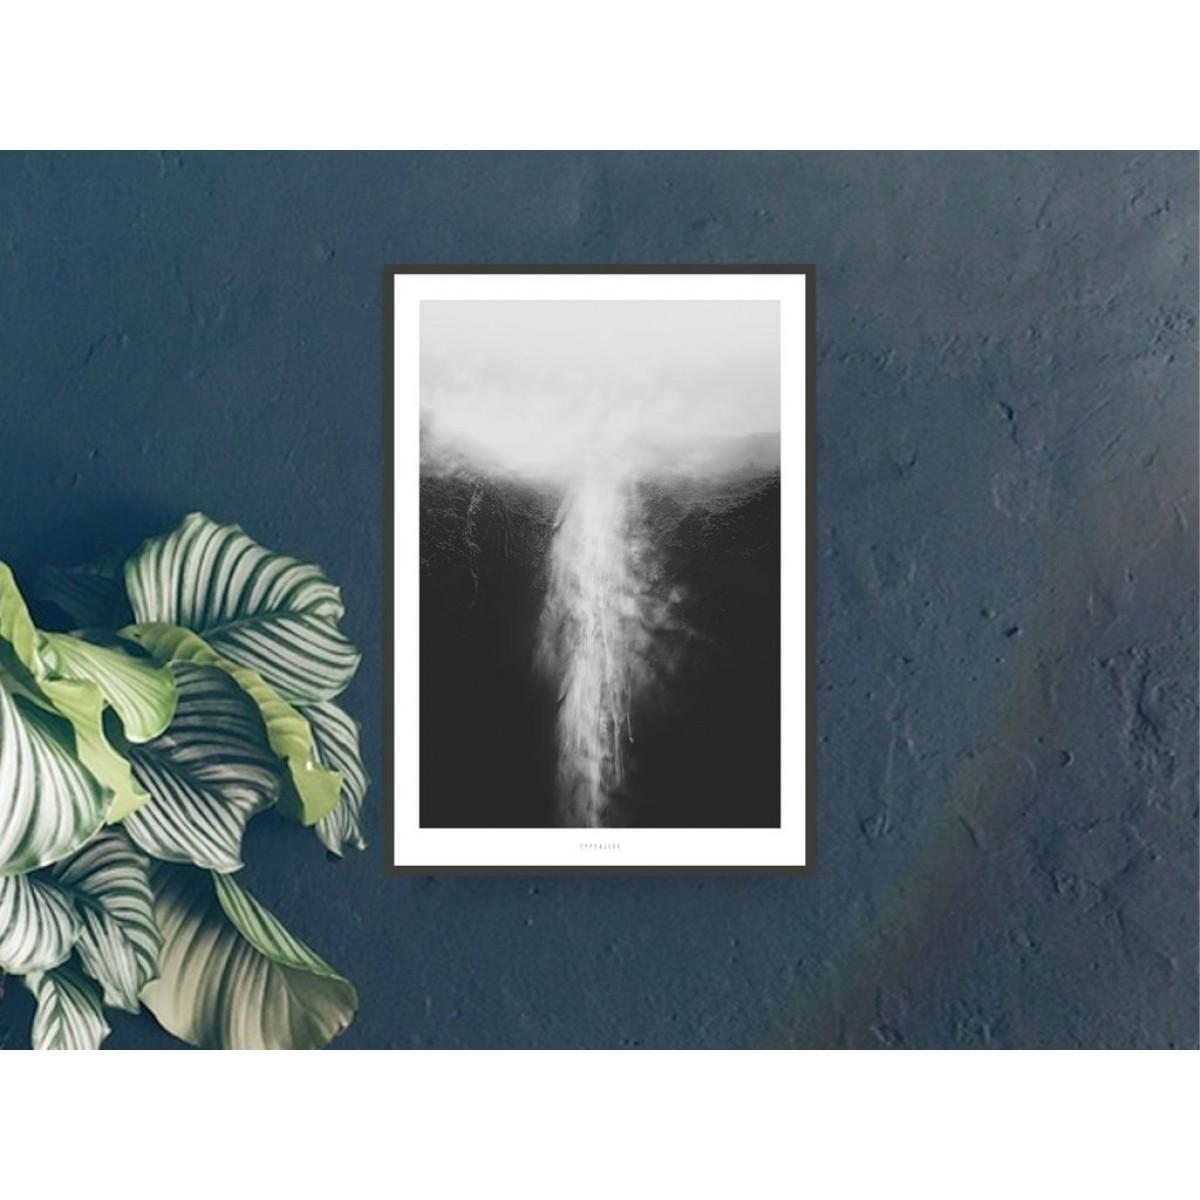 typealive / Landscape No. 45